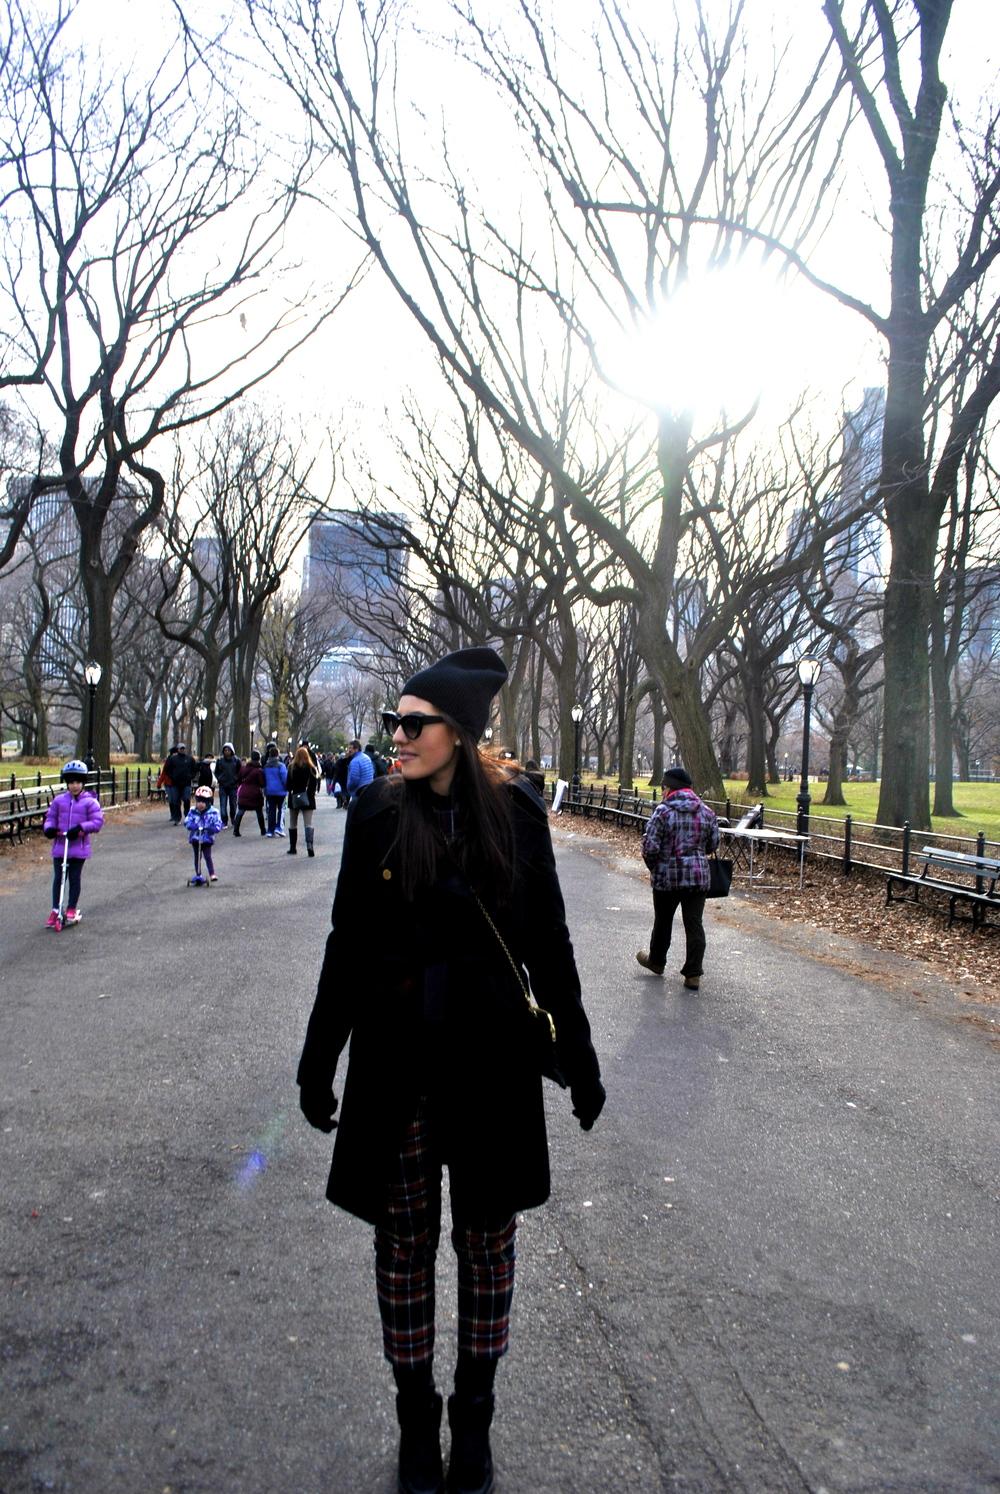 Georgie in Central Park